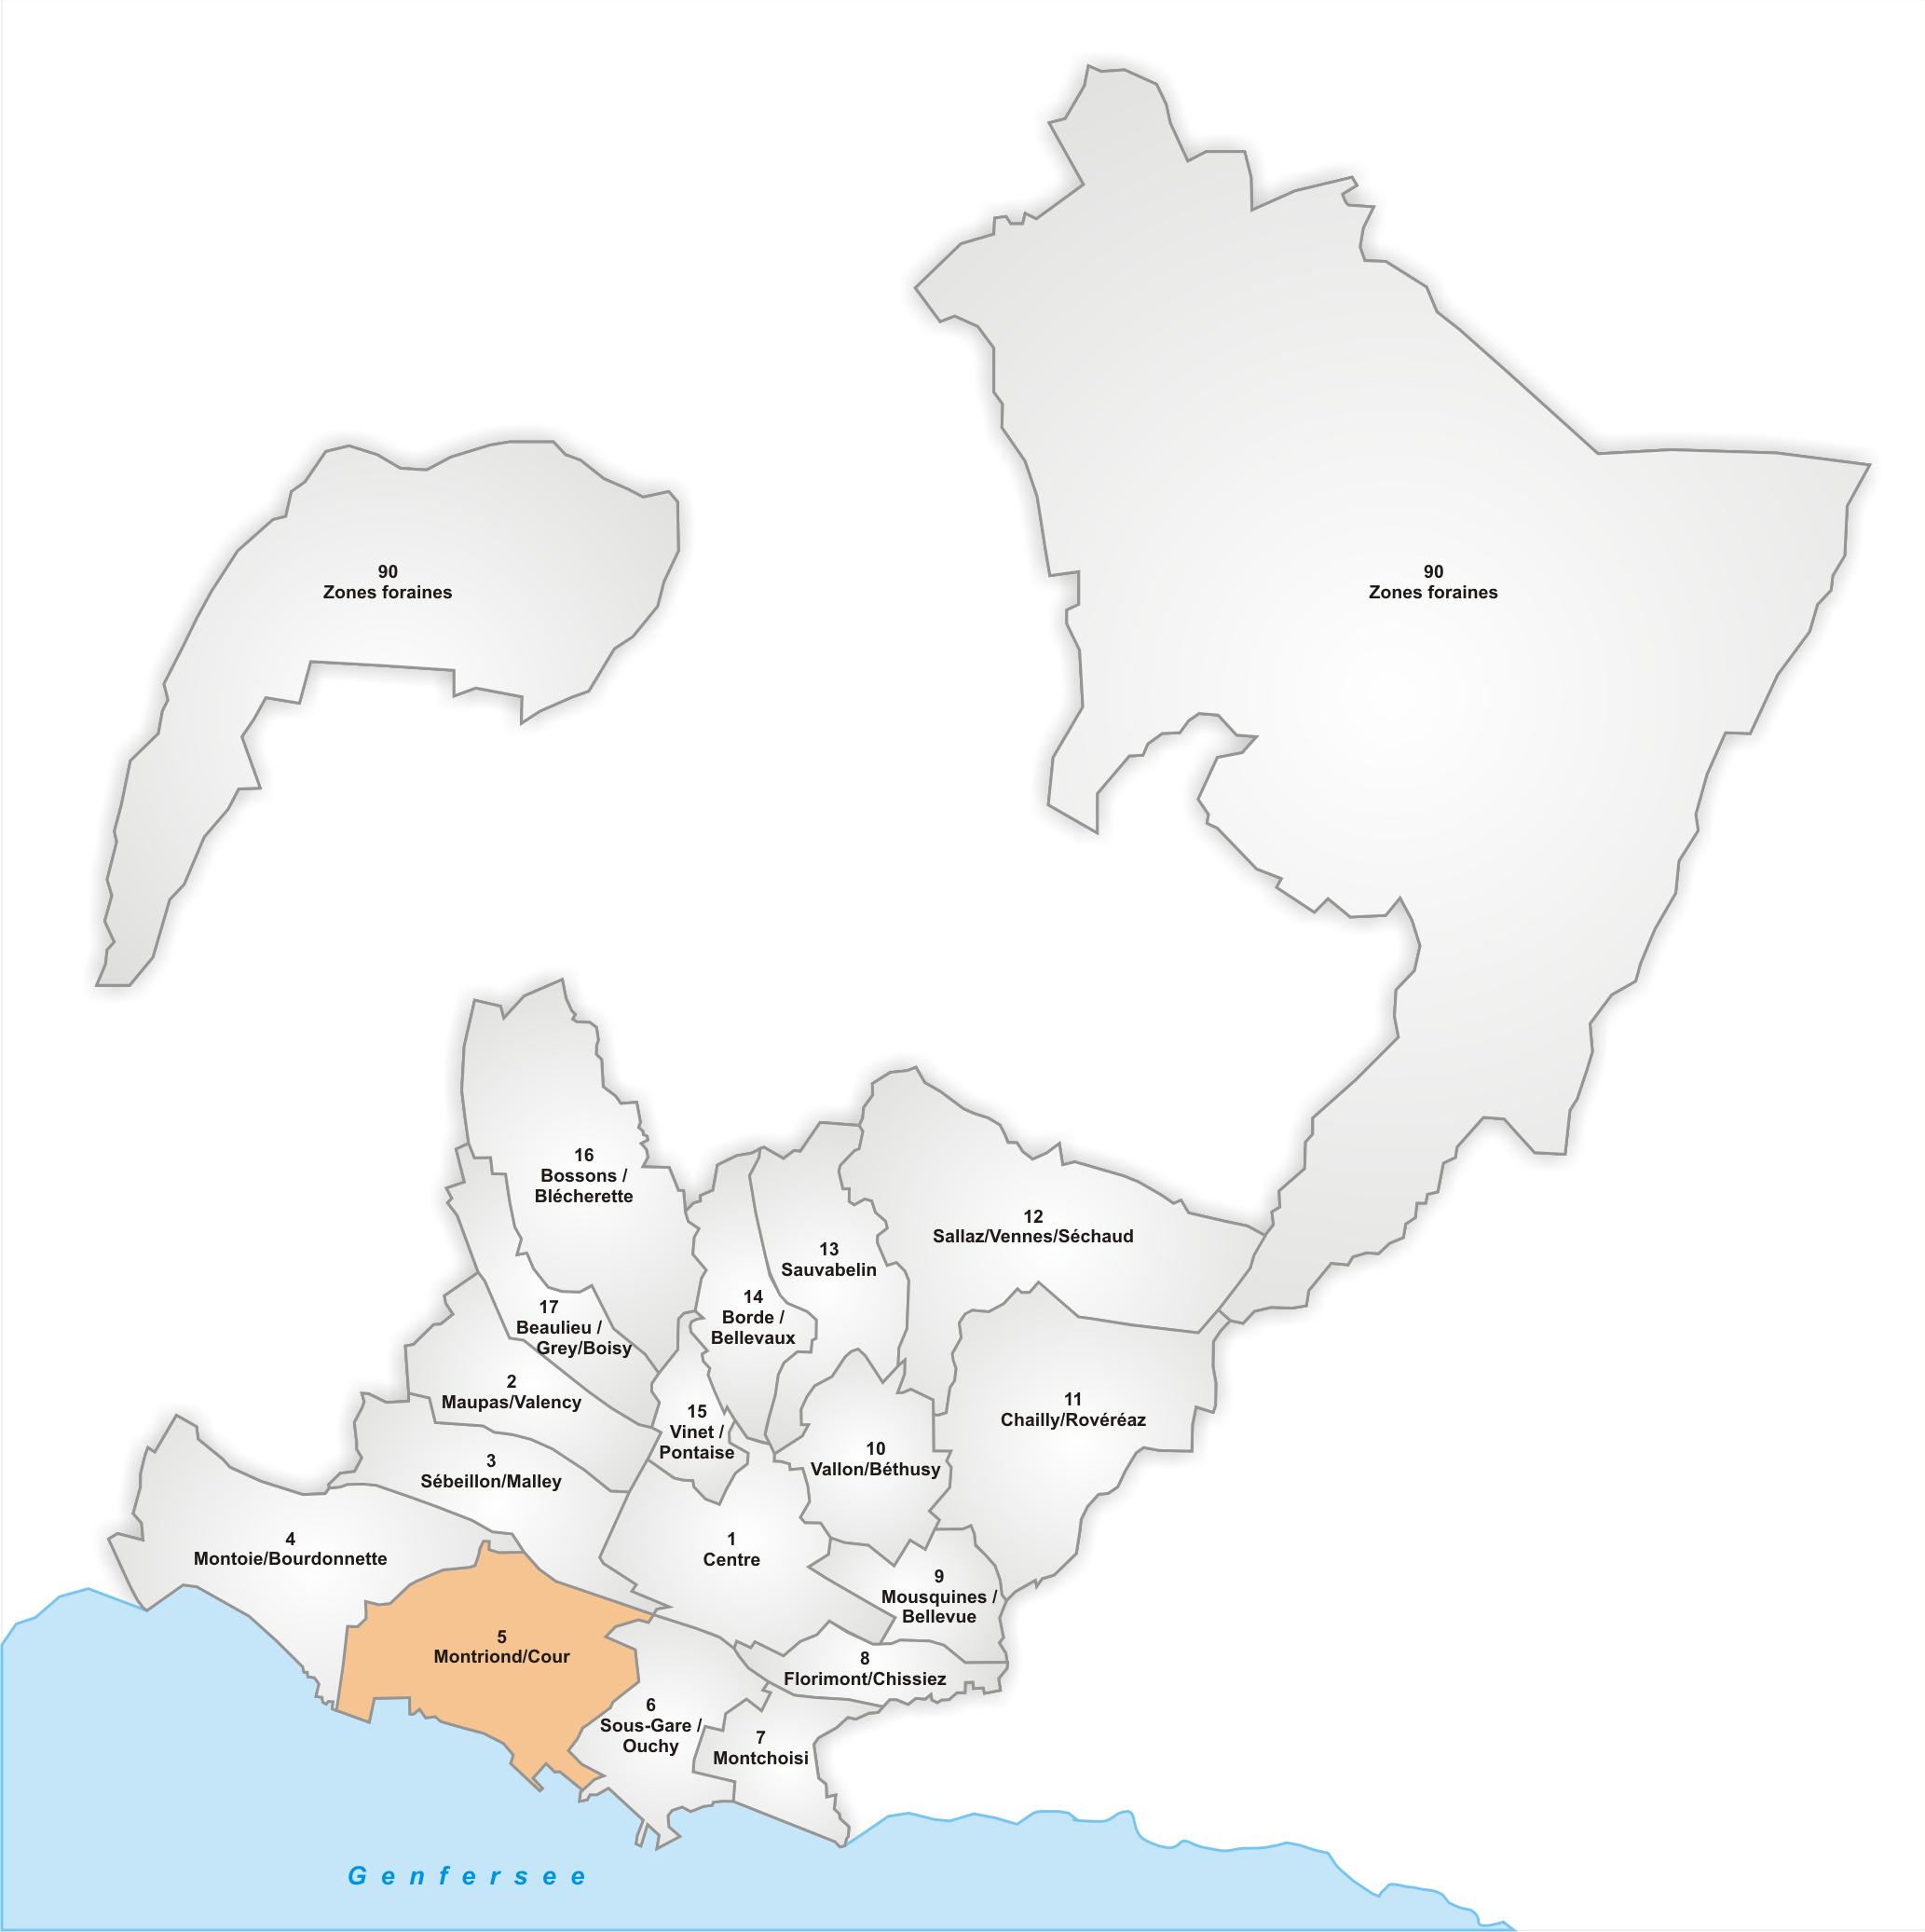 Lage des Stadtteils Montriond/Cour